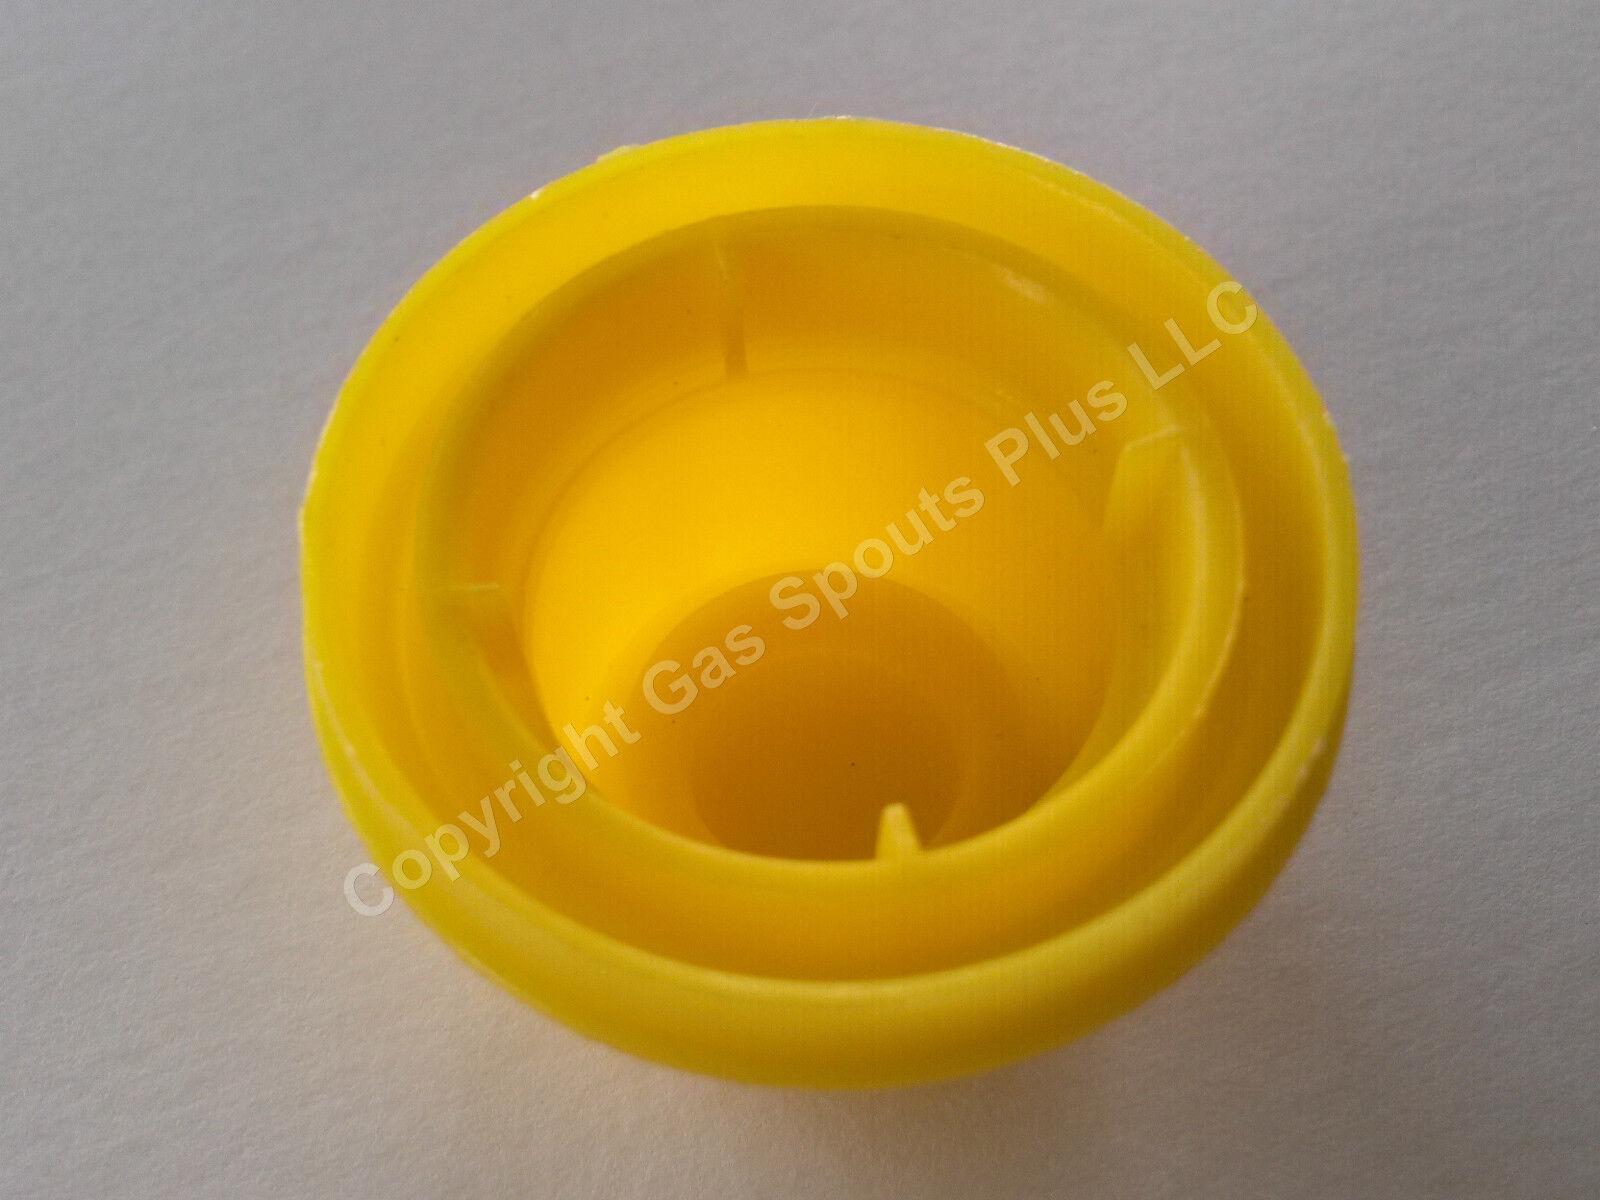 5PK BLITZ Replacement YELLOW SPOUT CAP Top Fuel GAS CAN # 900302 900092 900094